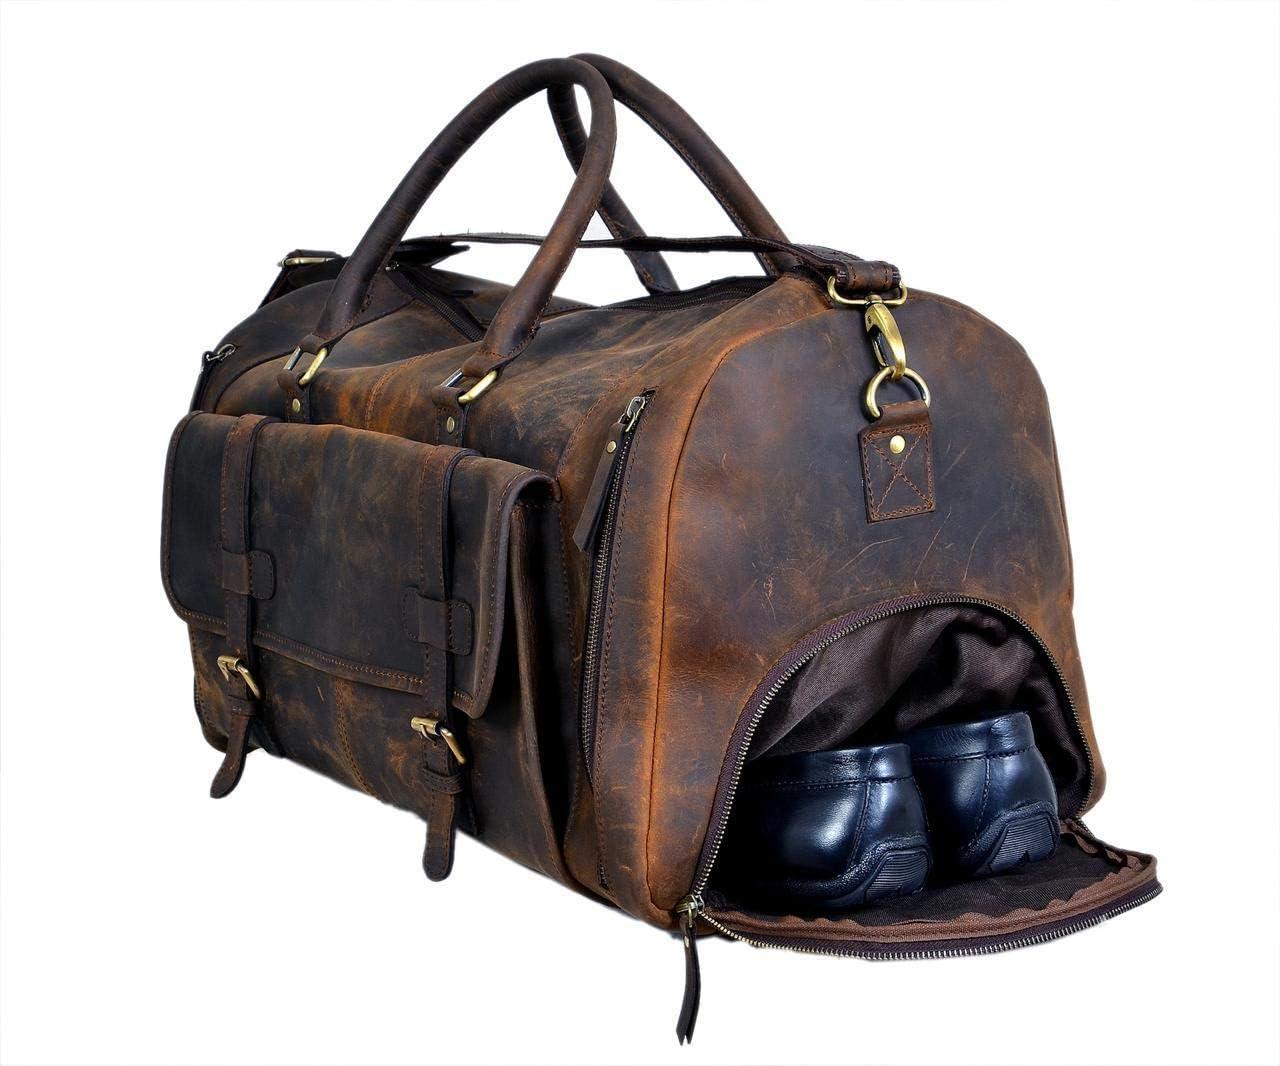 Mens Leather Duffle Weekend Bag Large Travel Womens Holdall Handbag Luggage G1L9